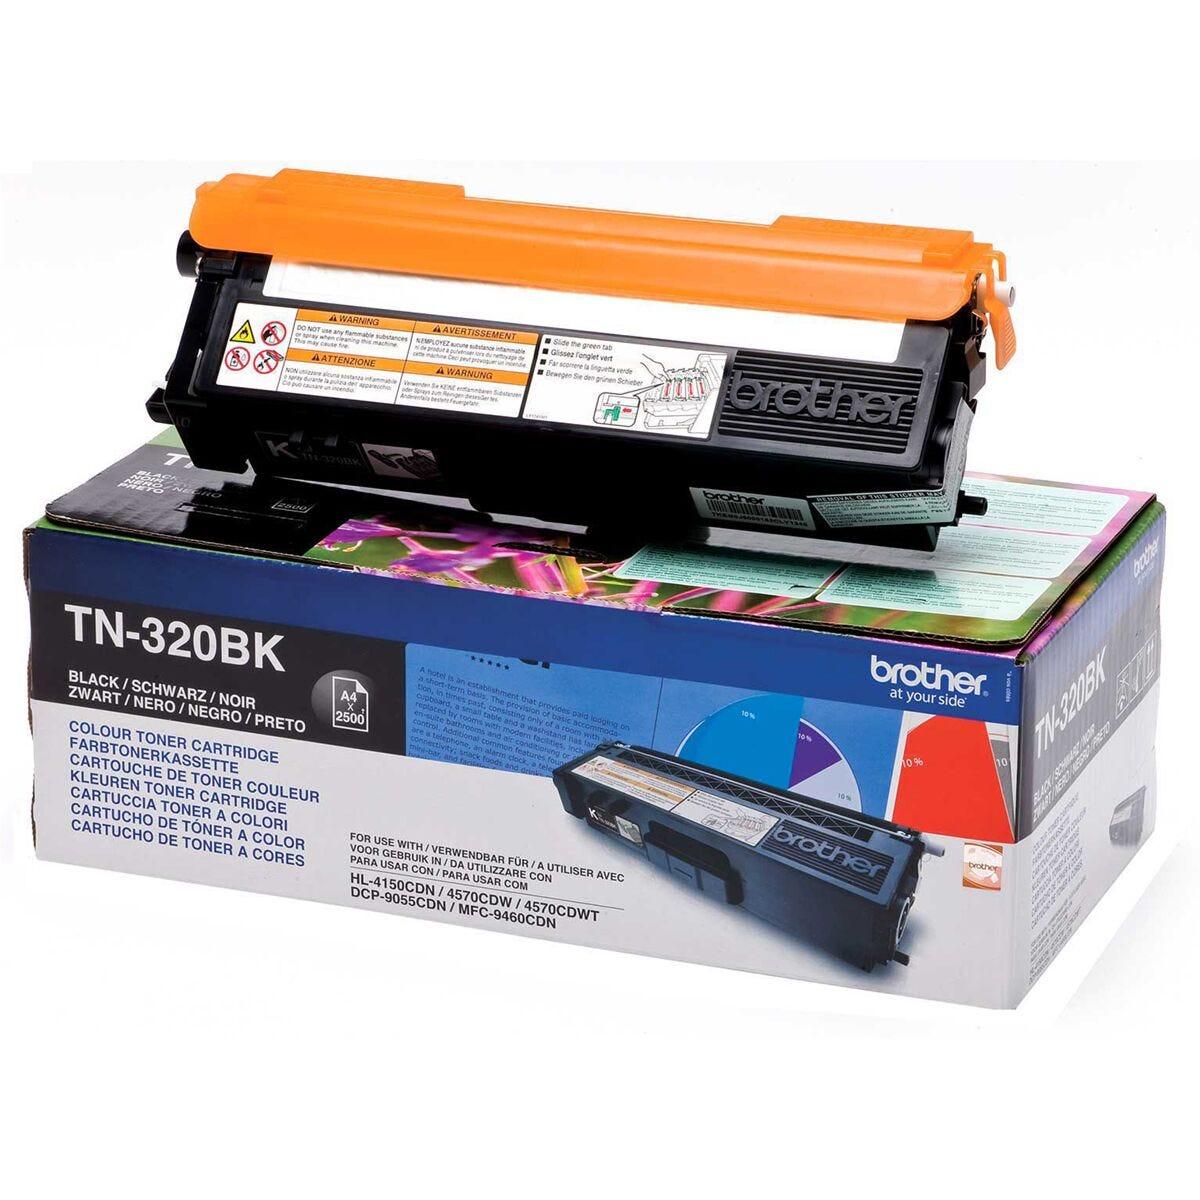 Brother TN 320 Printer Ink Toner Cartridge